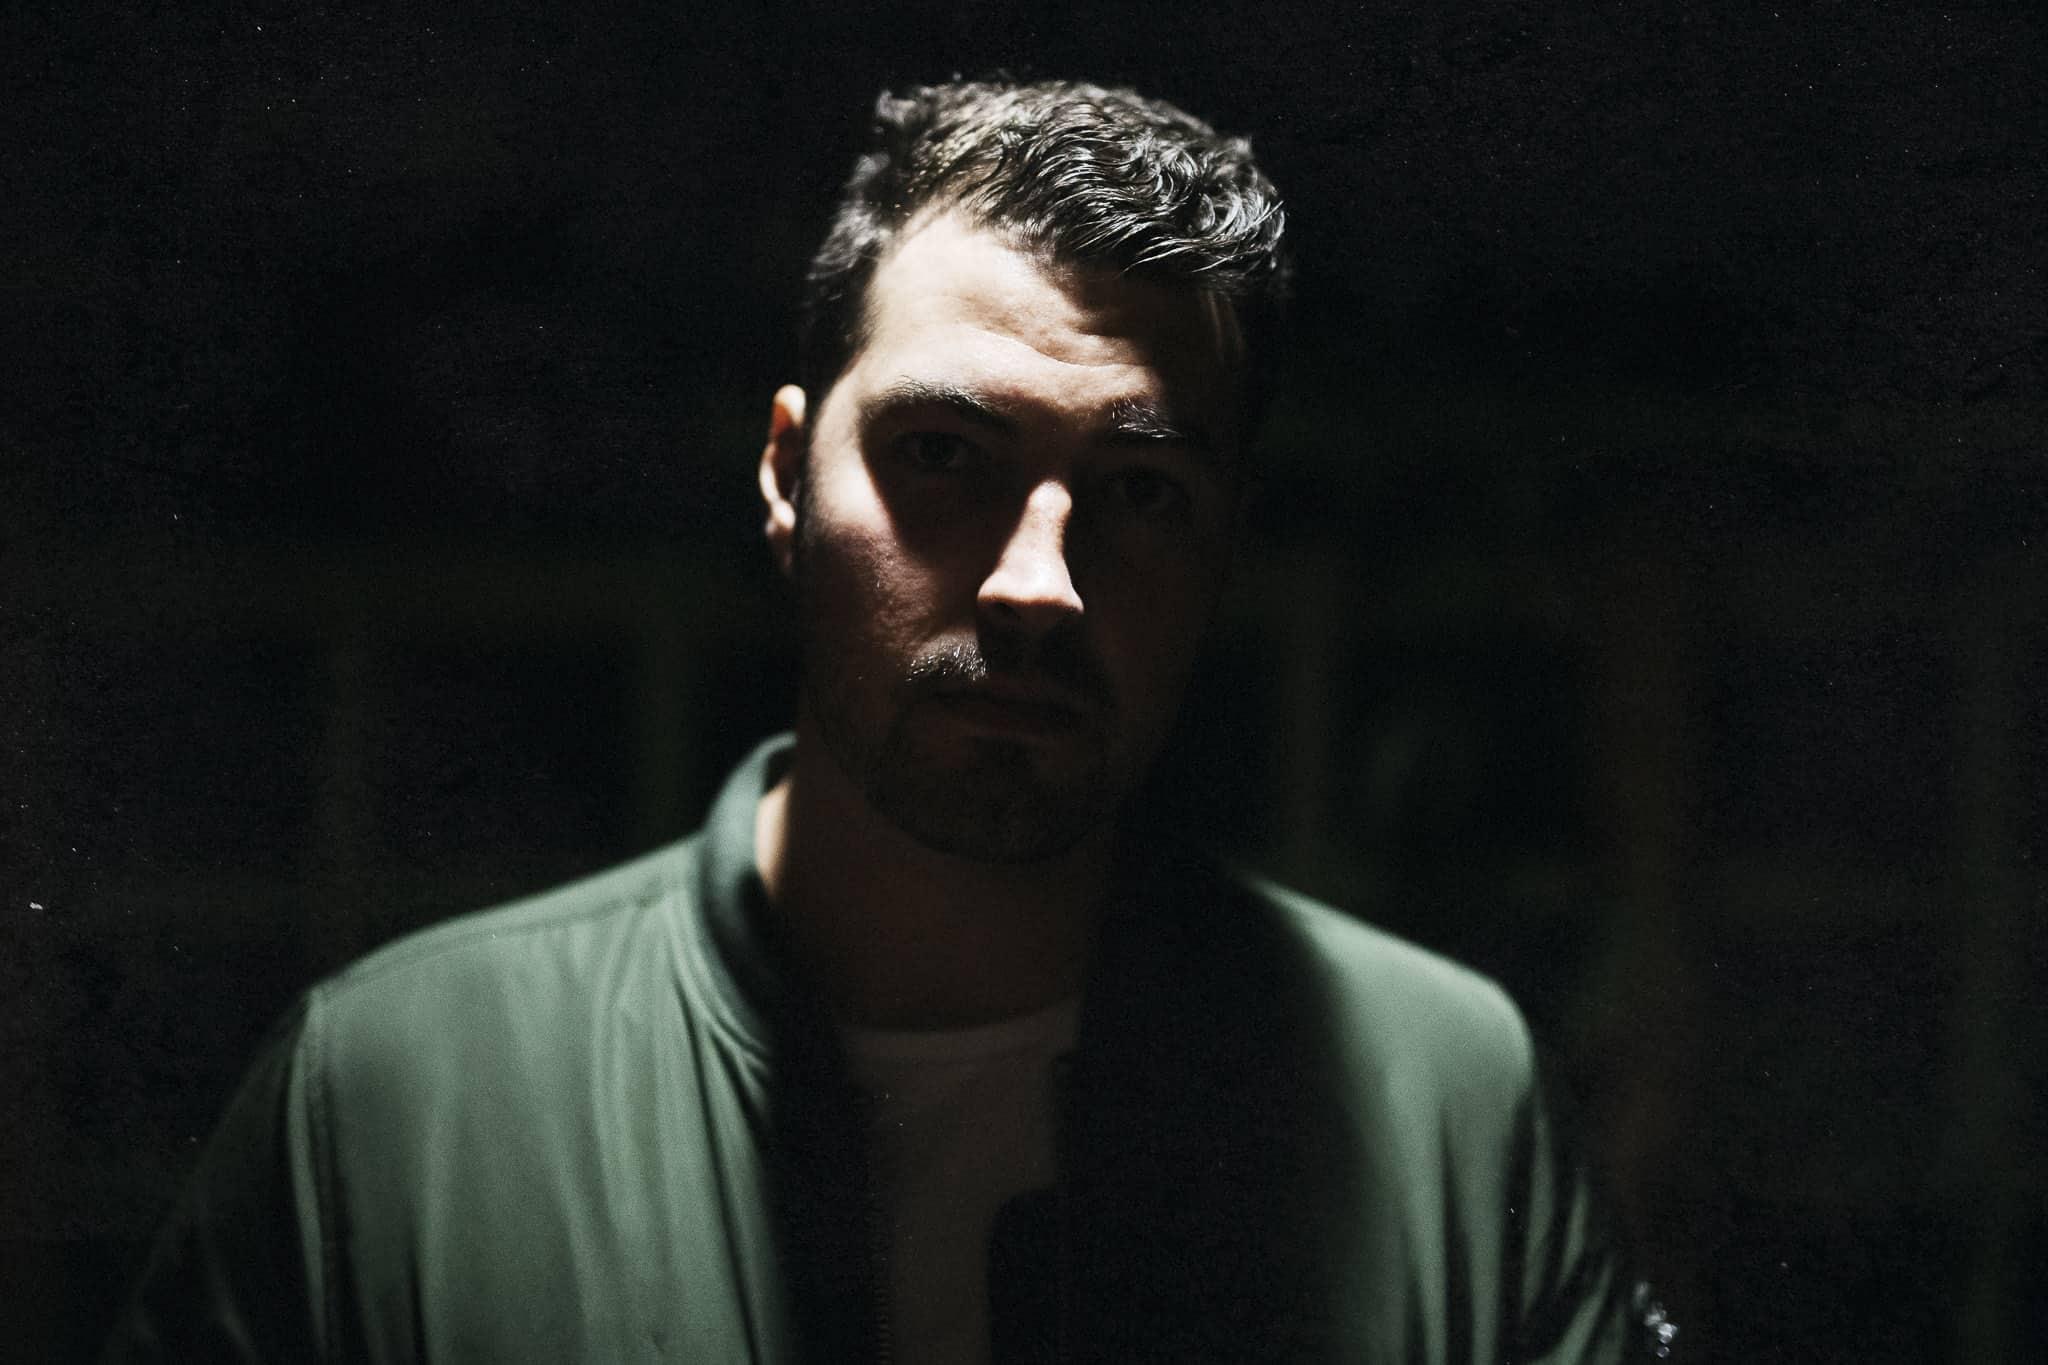 Hayden James Reveals Music Video for 'Just Friends' feat. Boy Matthews